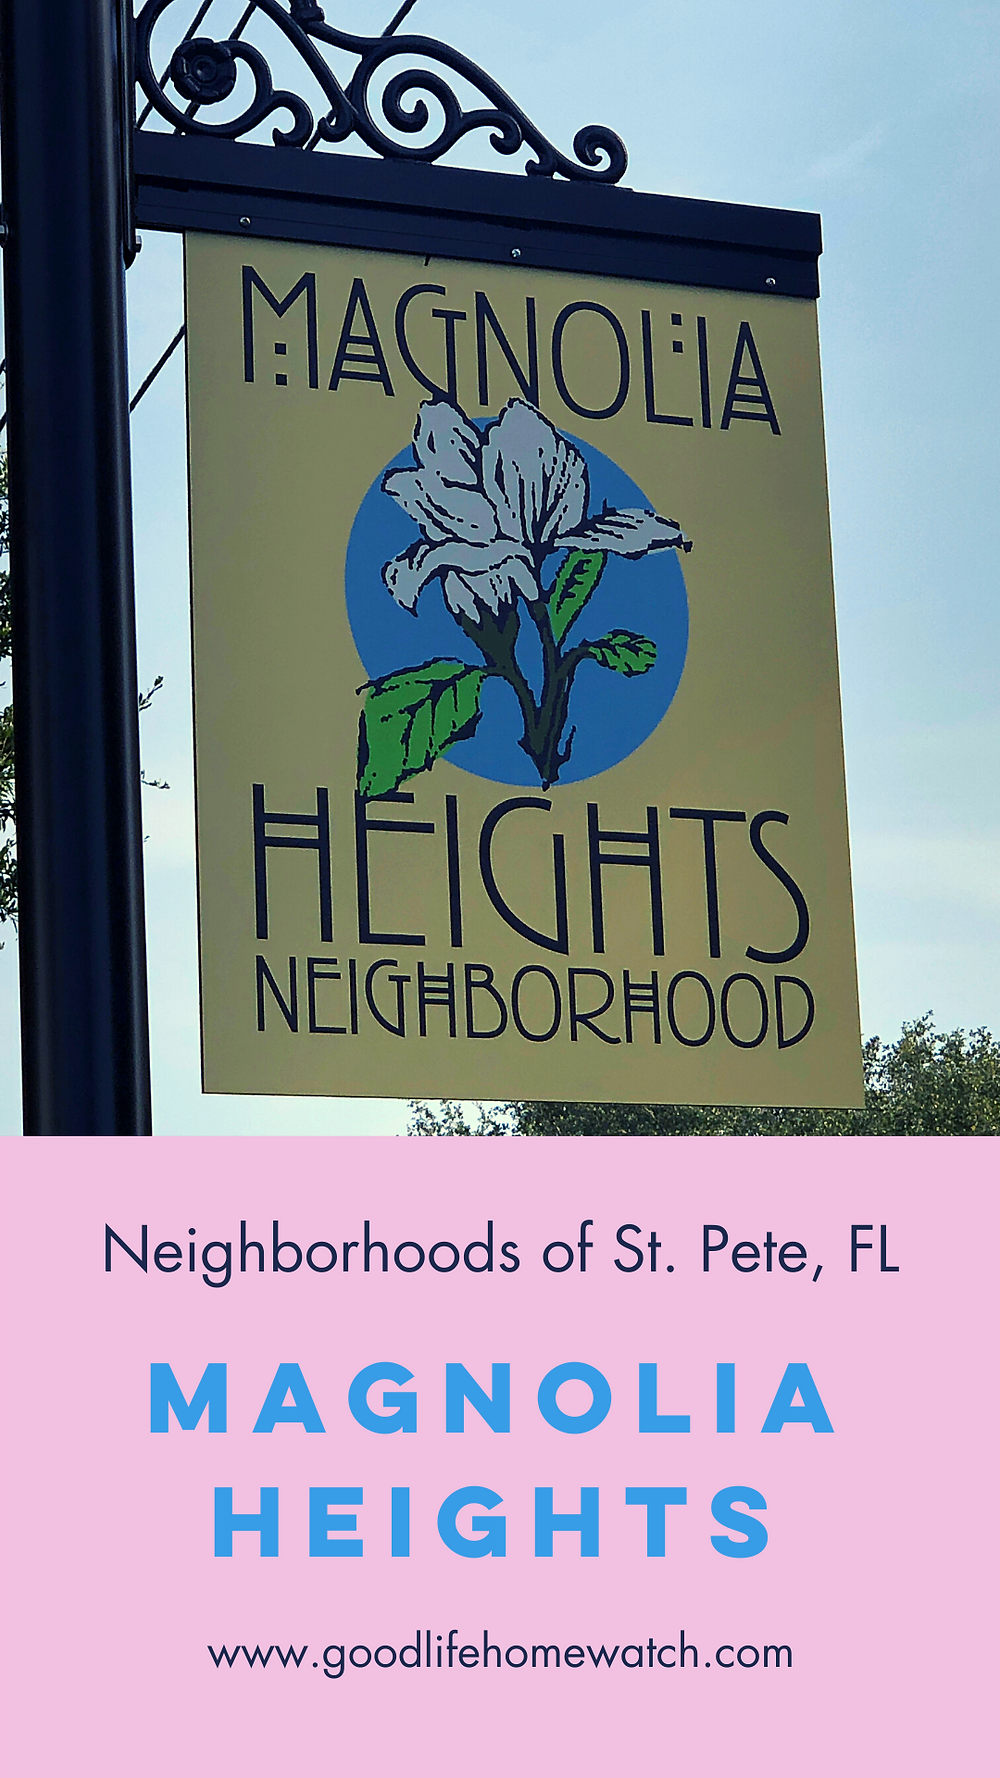 Old Northeast Neighborhood sign in St. Petersburg, FL